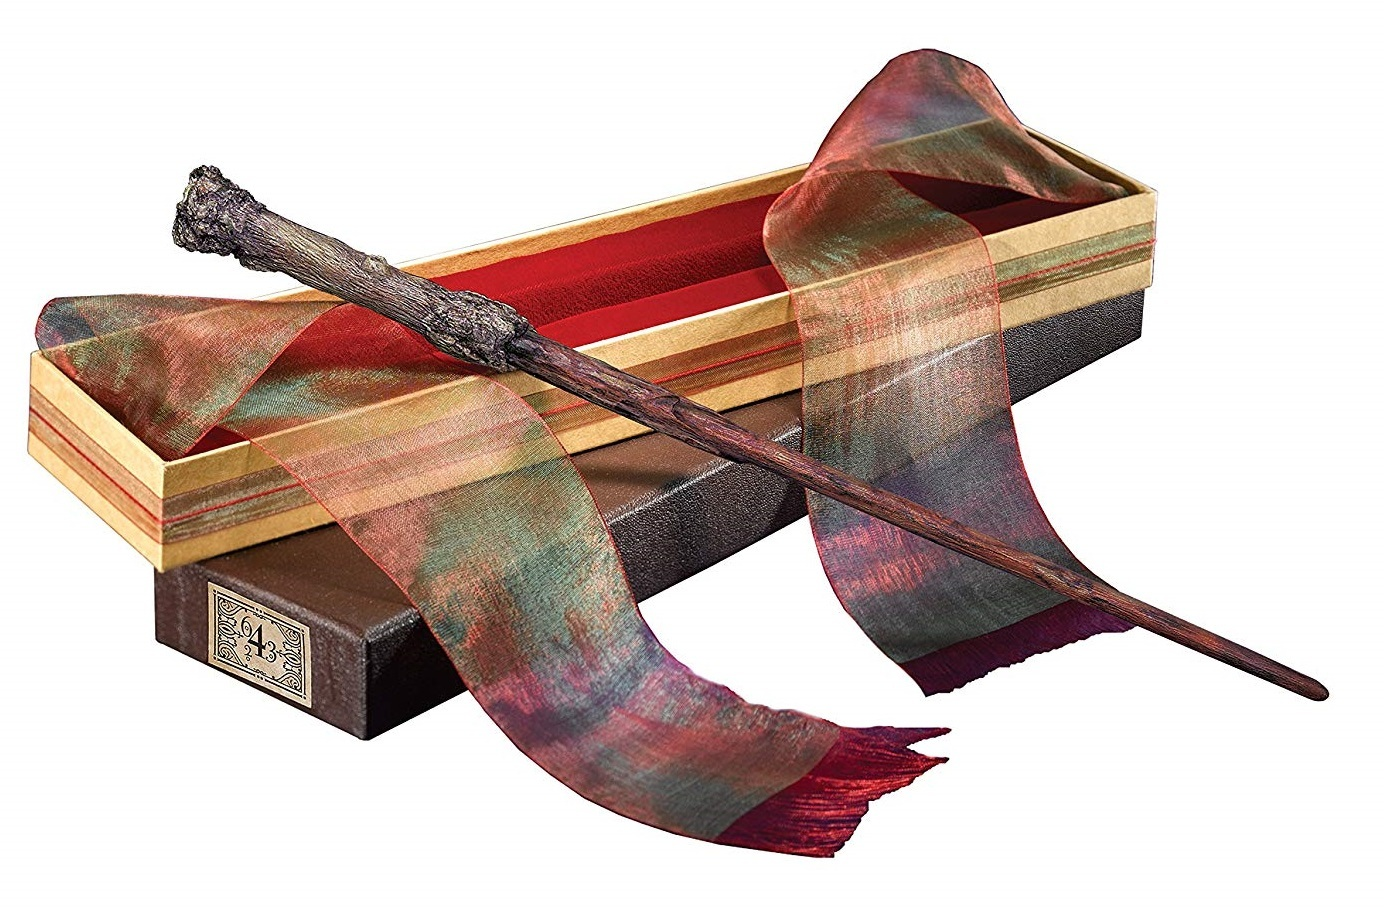 Harry Potter: Premium Replica Wand - Harry Potter image